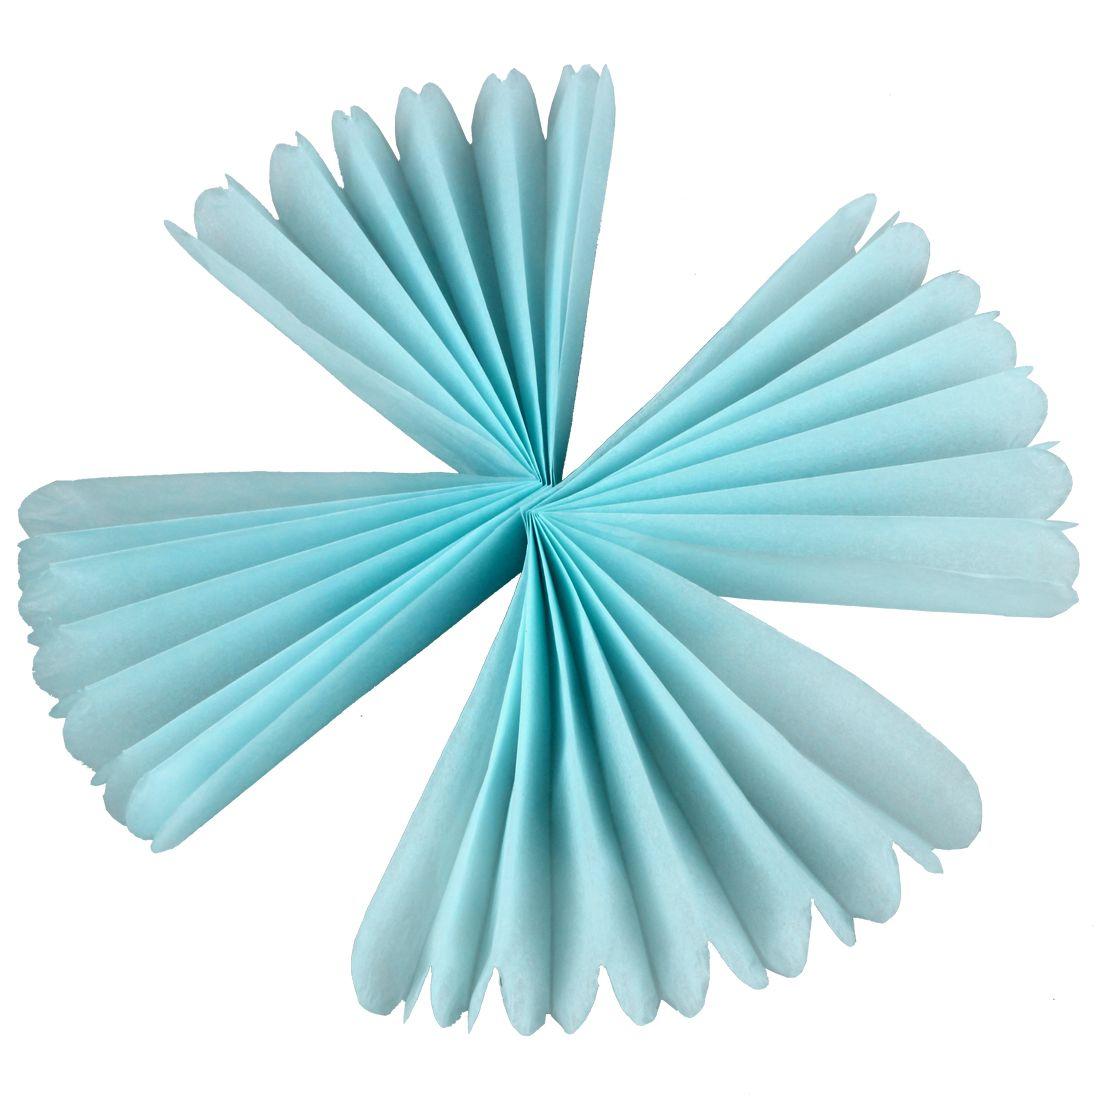 Light blue wedding decoration ideas  pcs cminch Tissue Paper Wedding Party Decor Craft Paper